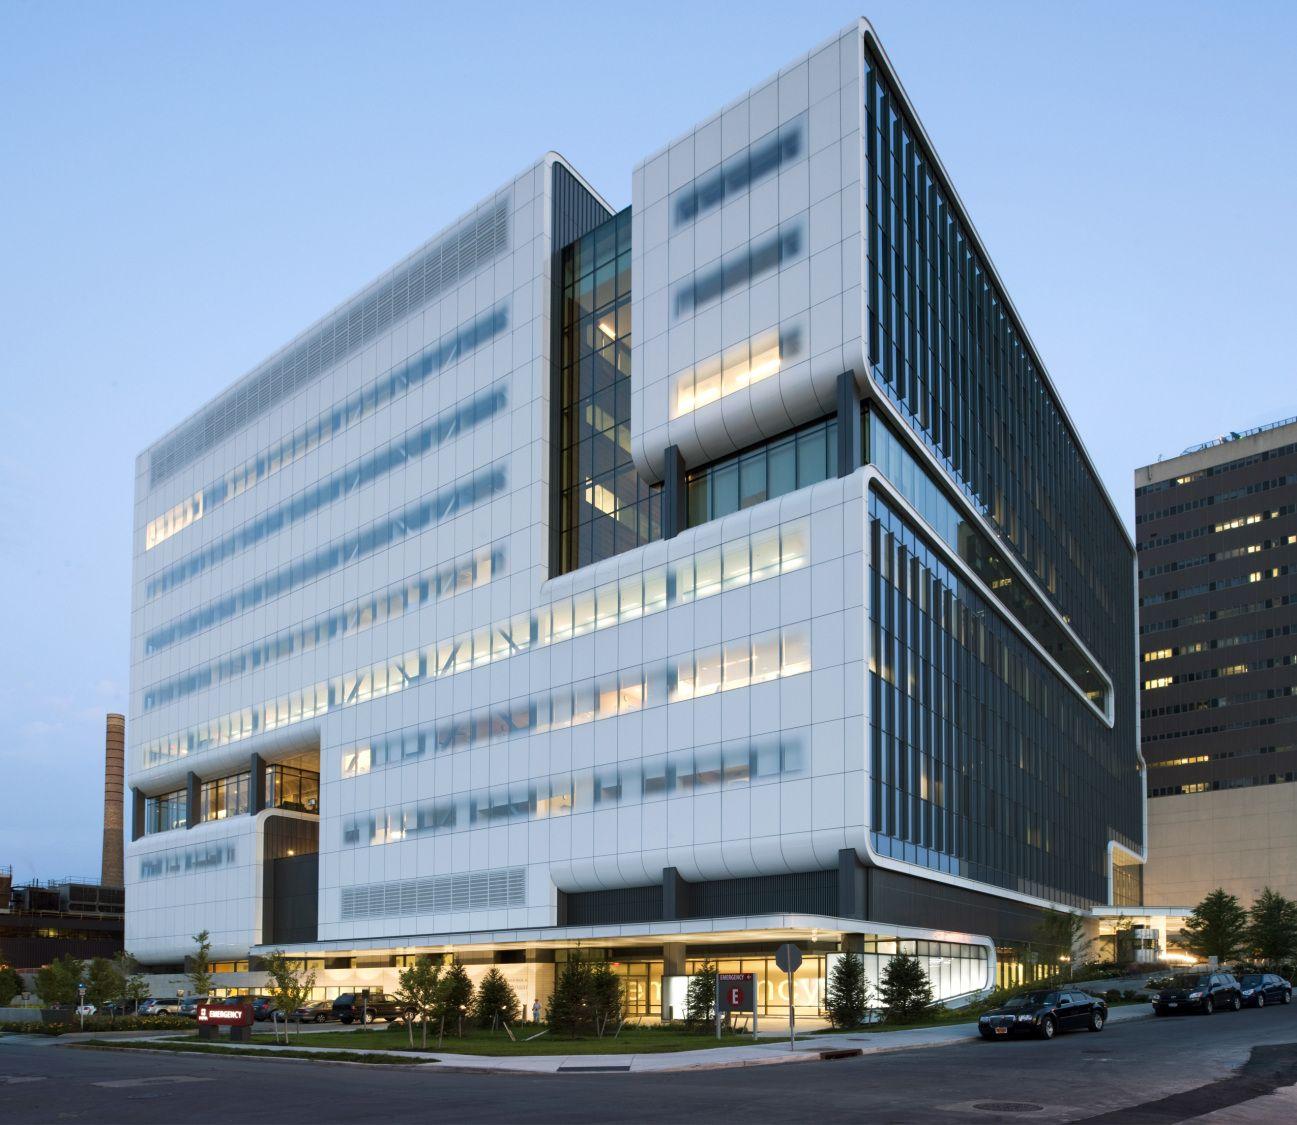 Gates vascular institute a new model for medical